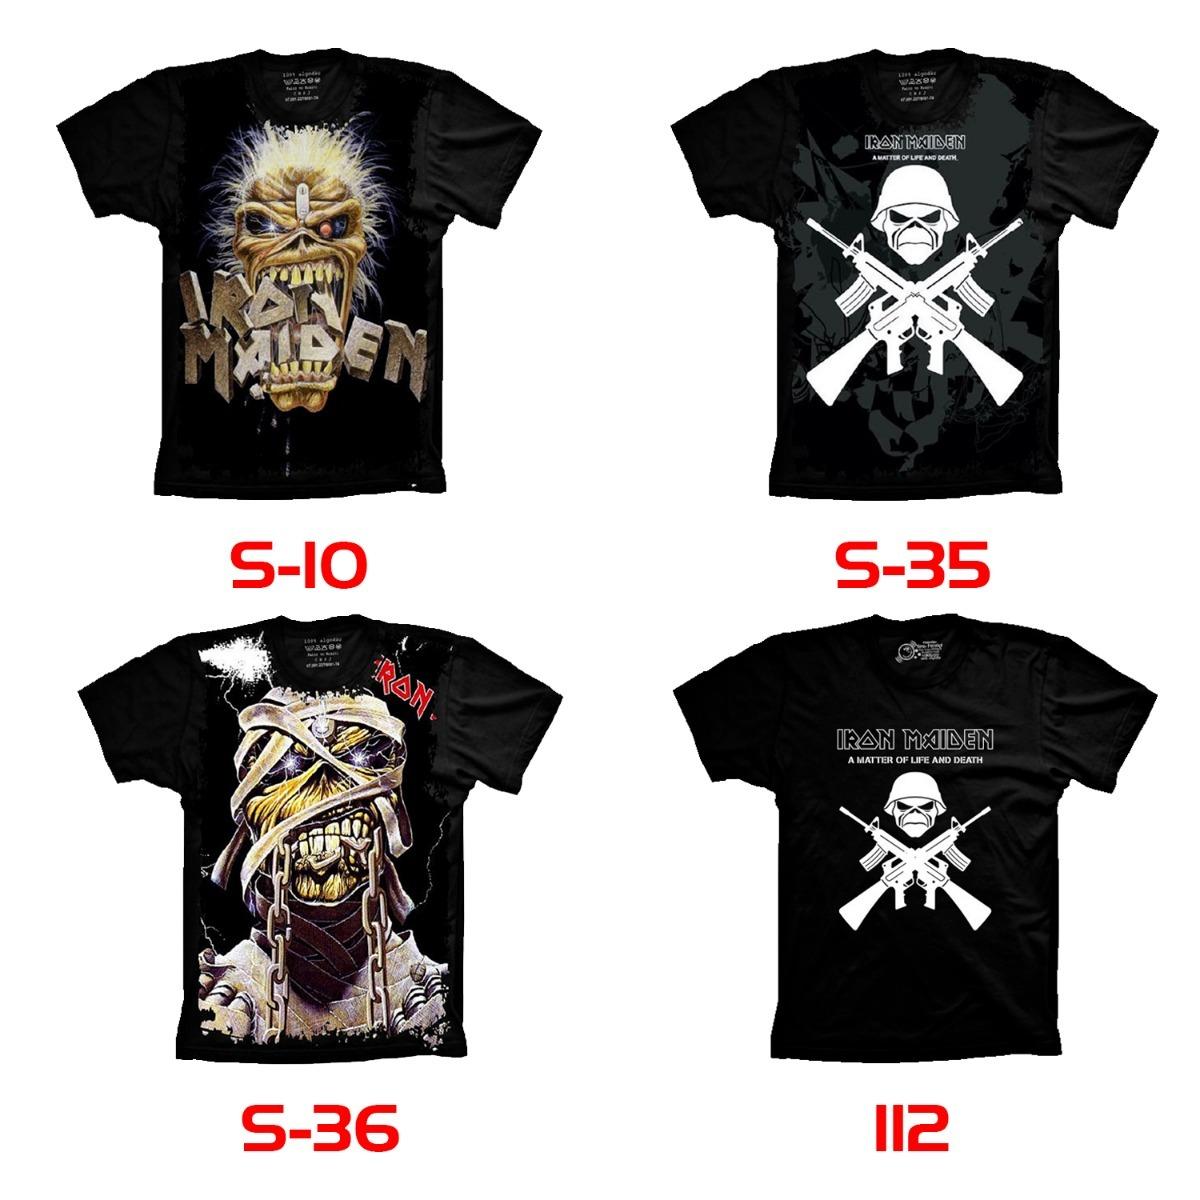 c06365fe2e camiseta banda iron maiden heavy metal. Carregando zoom.